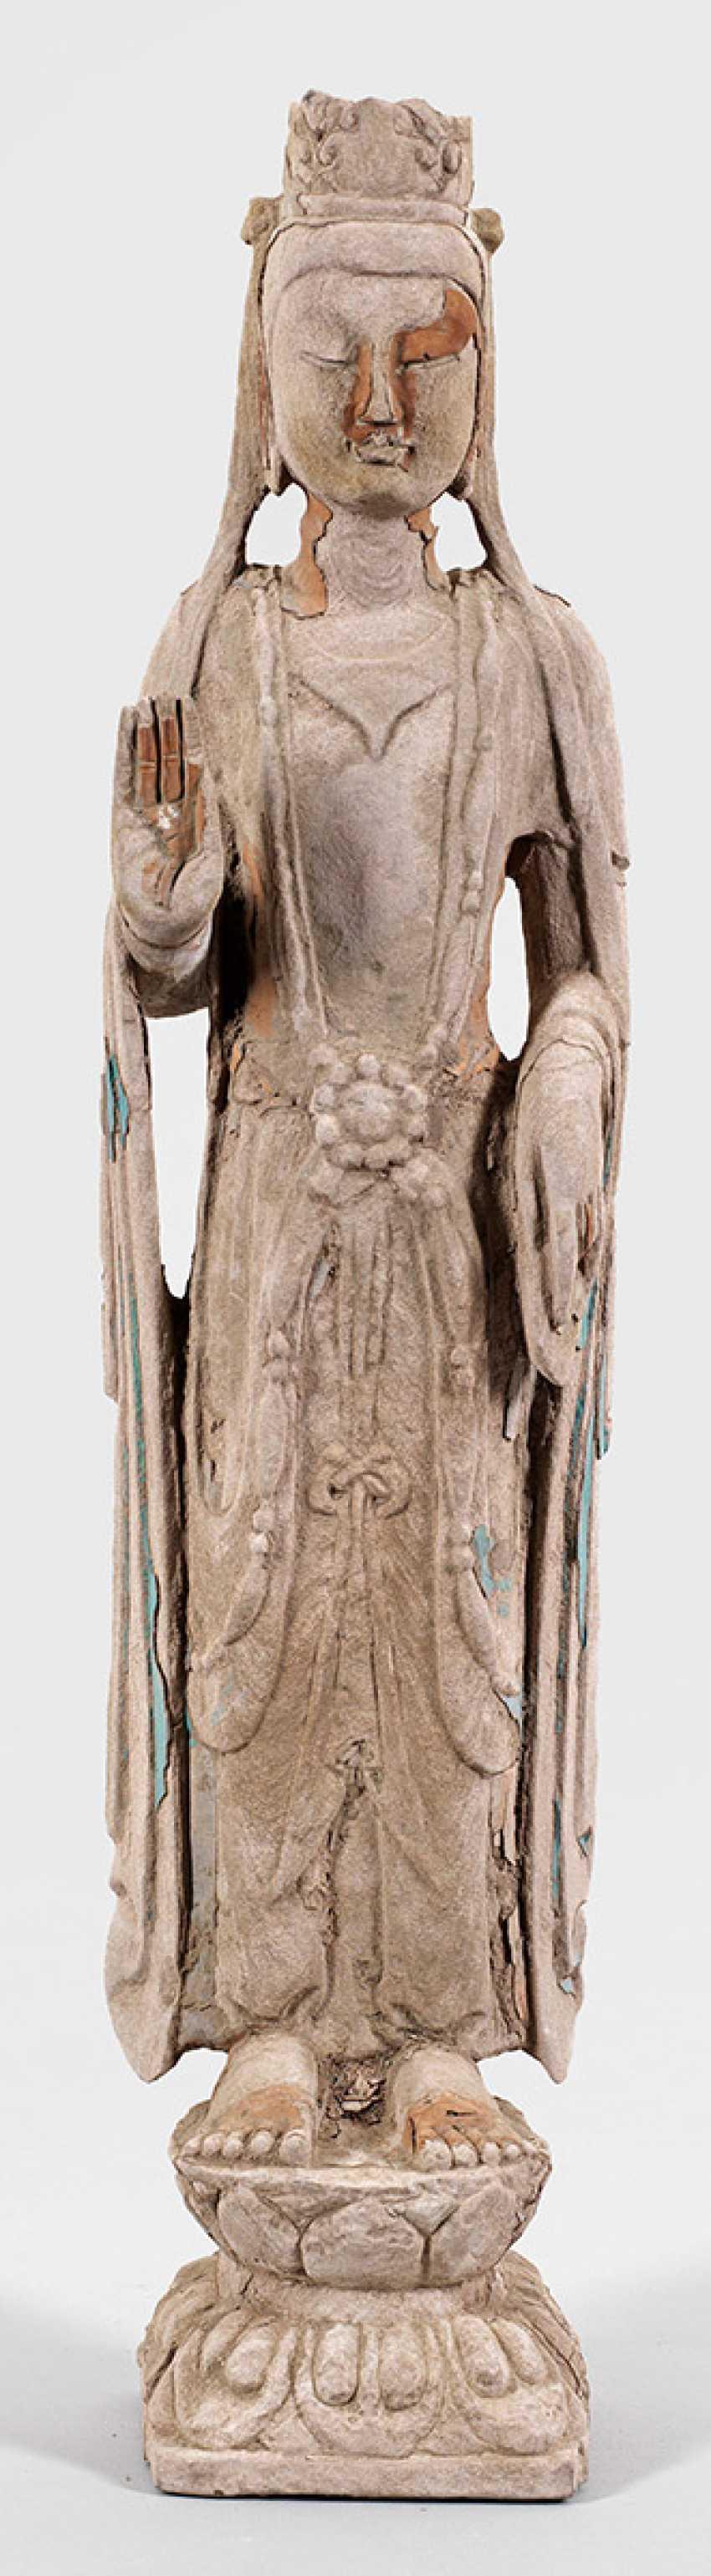 Big Guanyin-Sand Stone Statue - photo 1